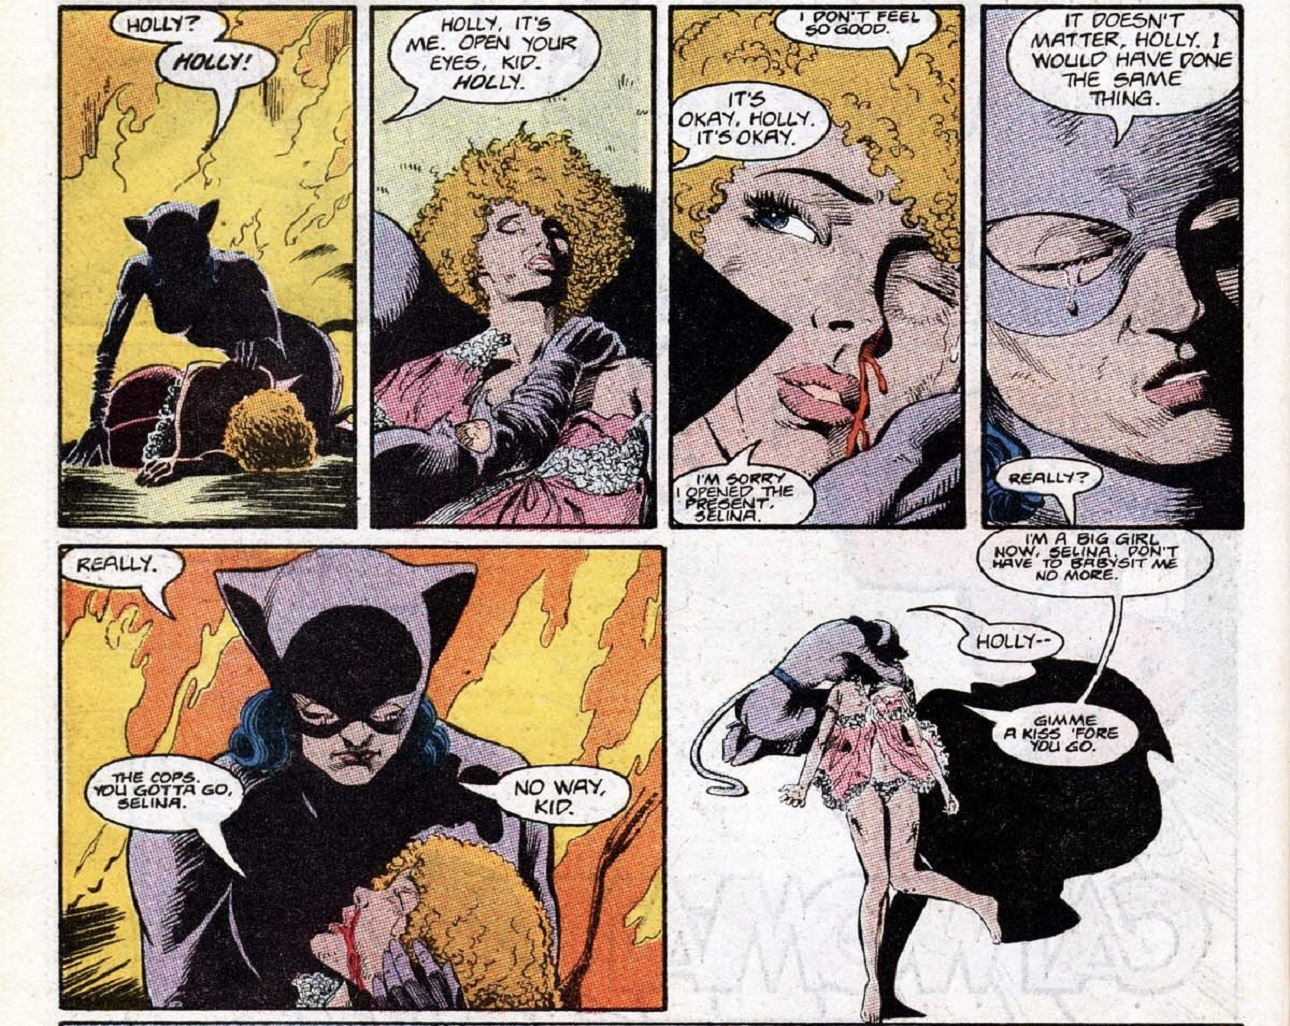 catwoman-holly-robinson-death.JPG